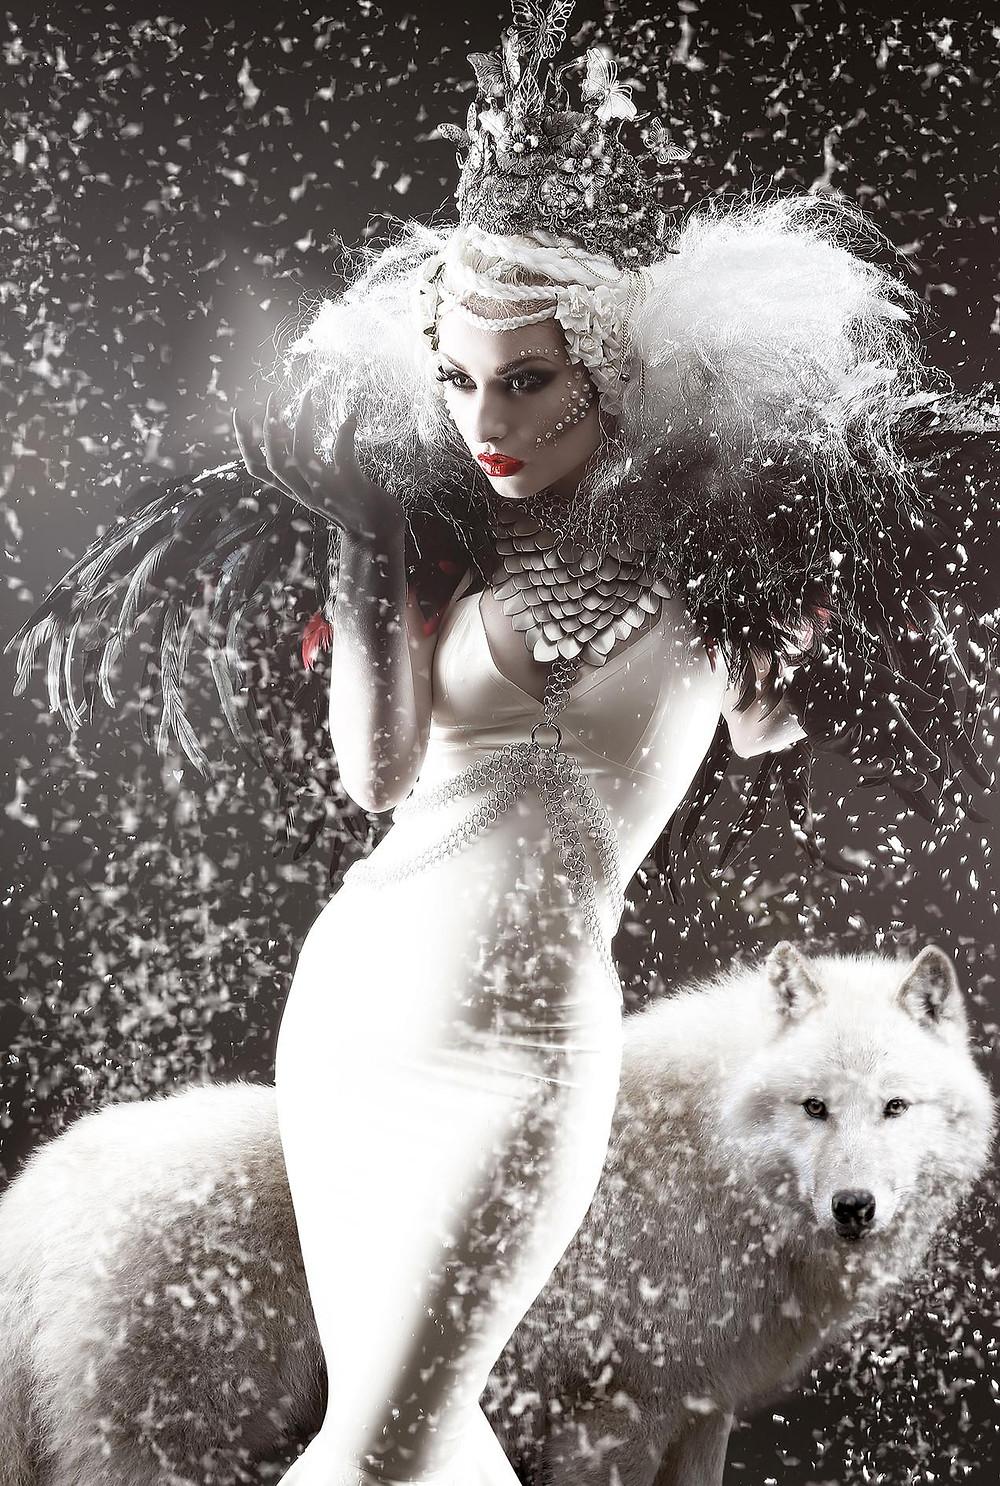 Fantasy Cosplay | Model: Romanie Smith | By Chrissy Sparks at DOLLHOUSE